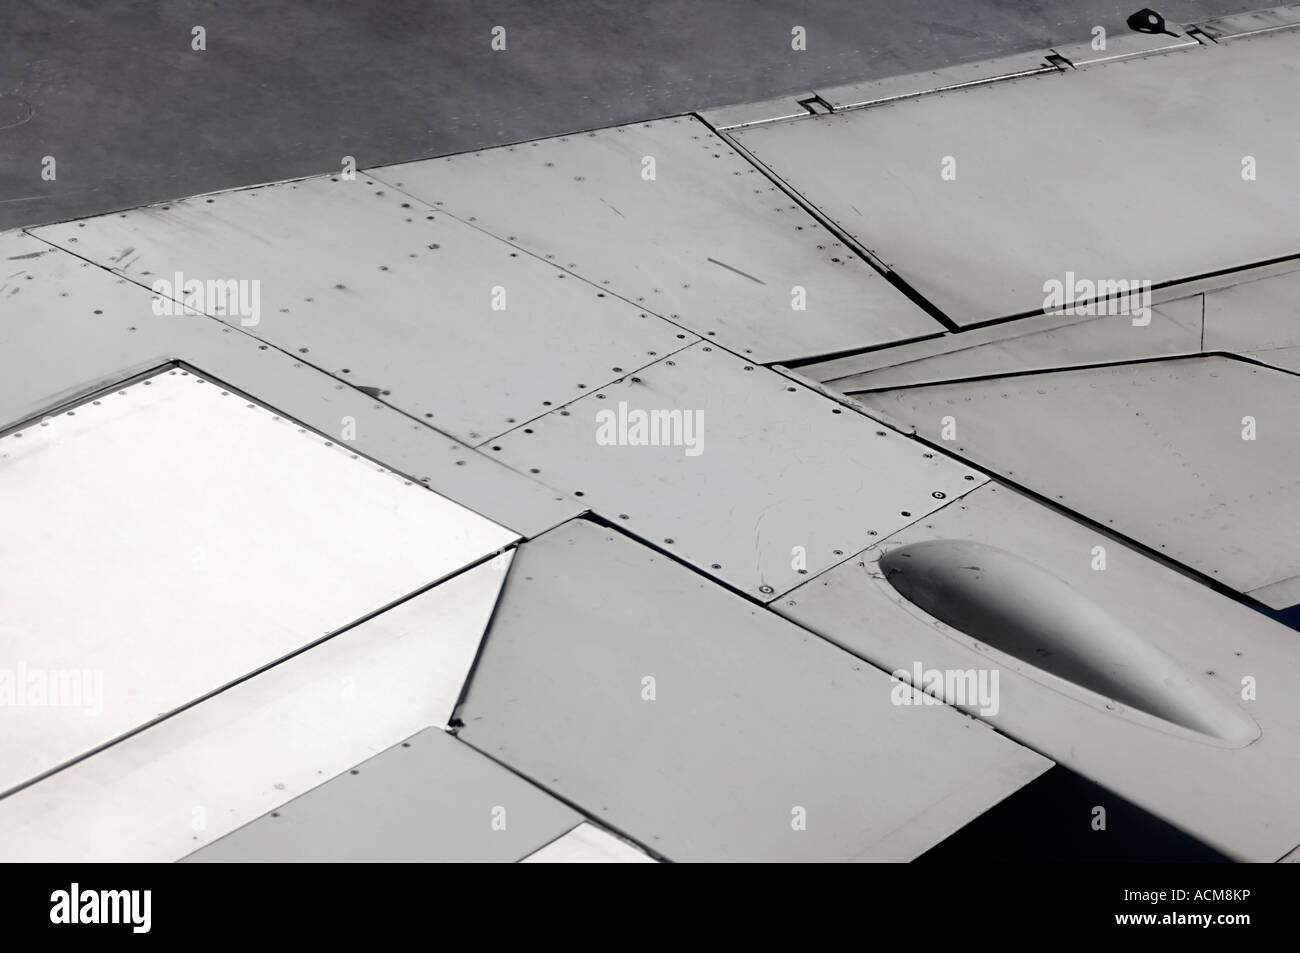 Flugzeug Flügel details Stockbild